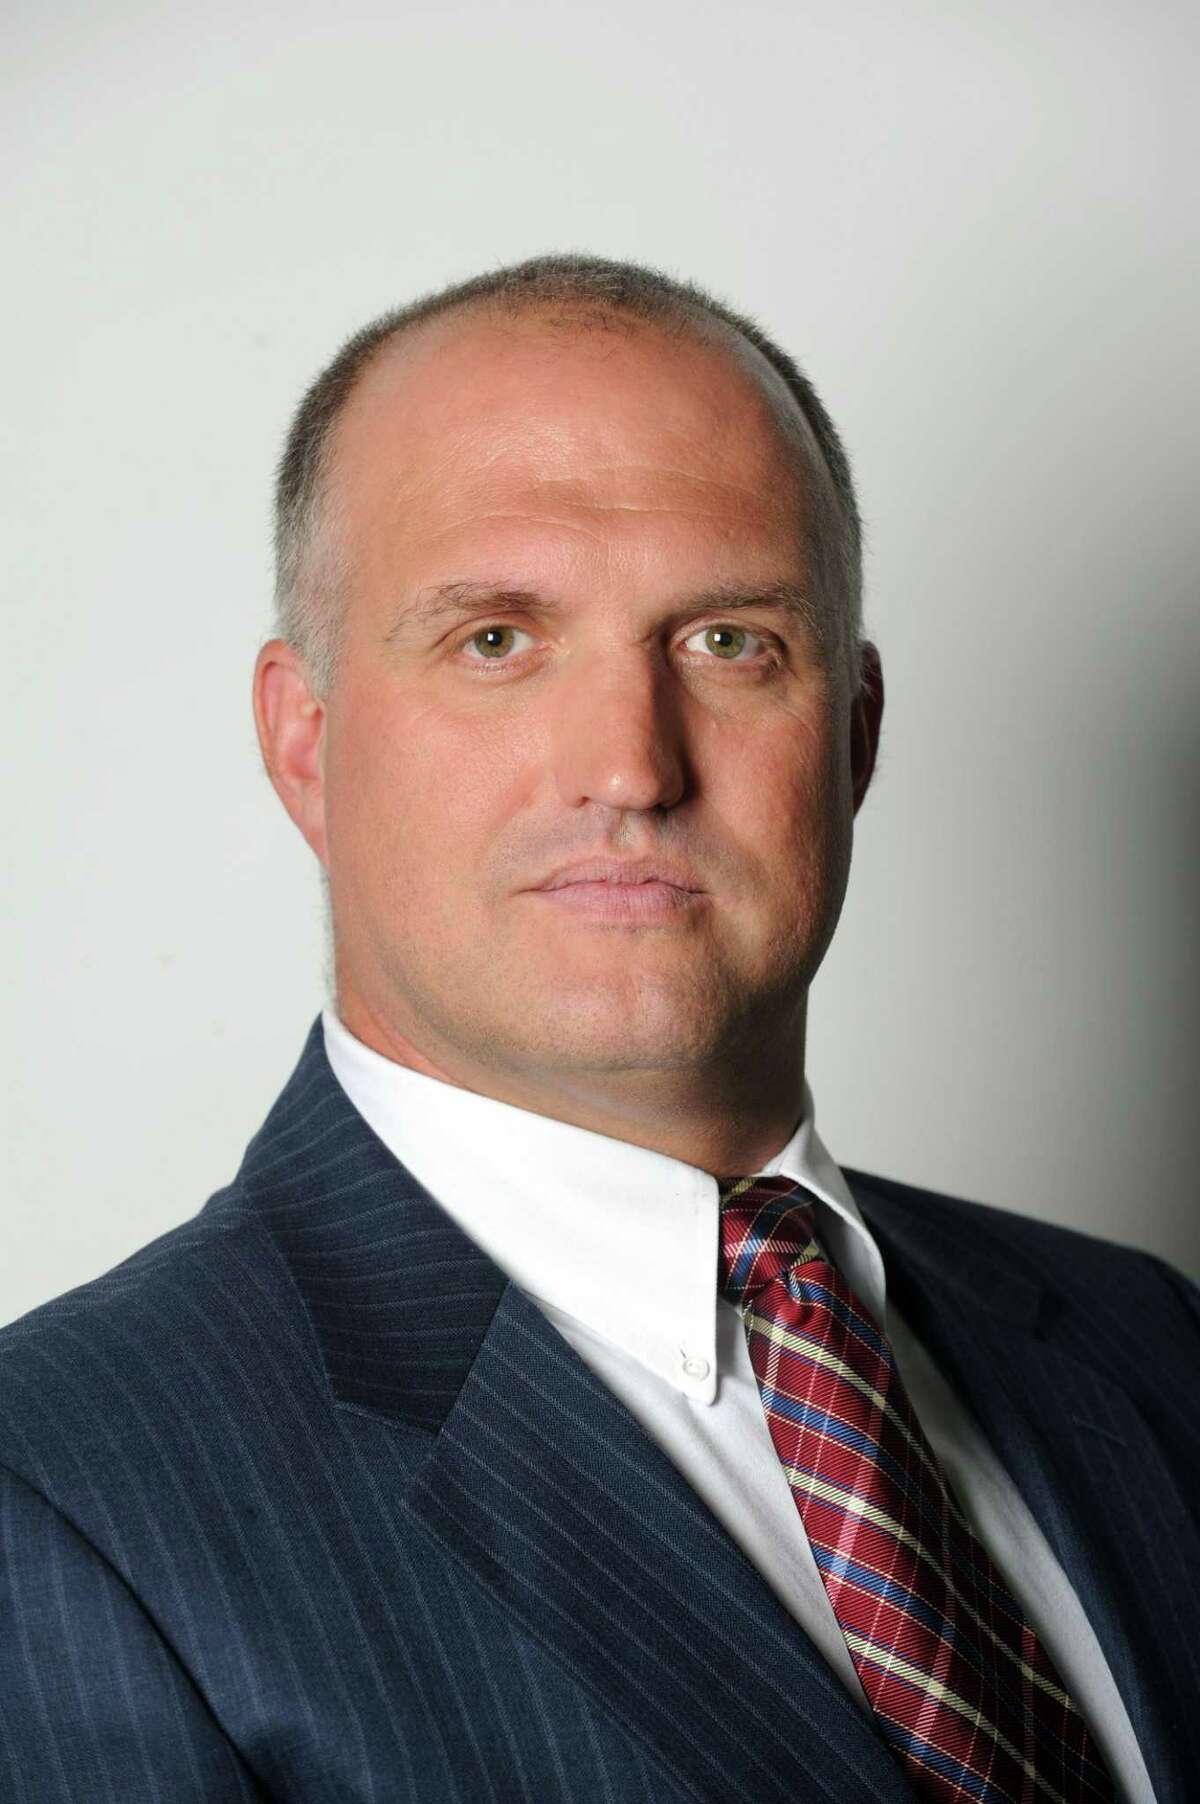 Fritz Blau, Stamford Board of Finance candidate